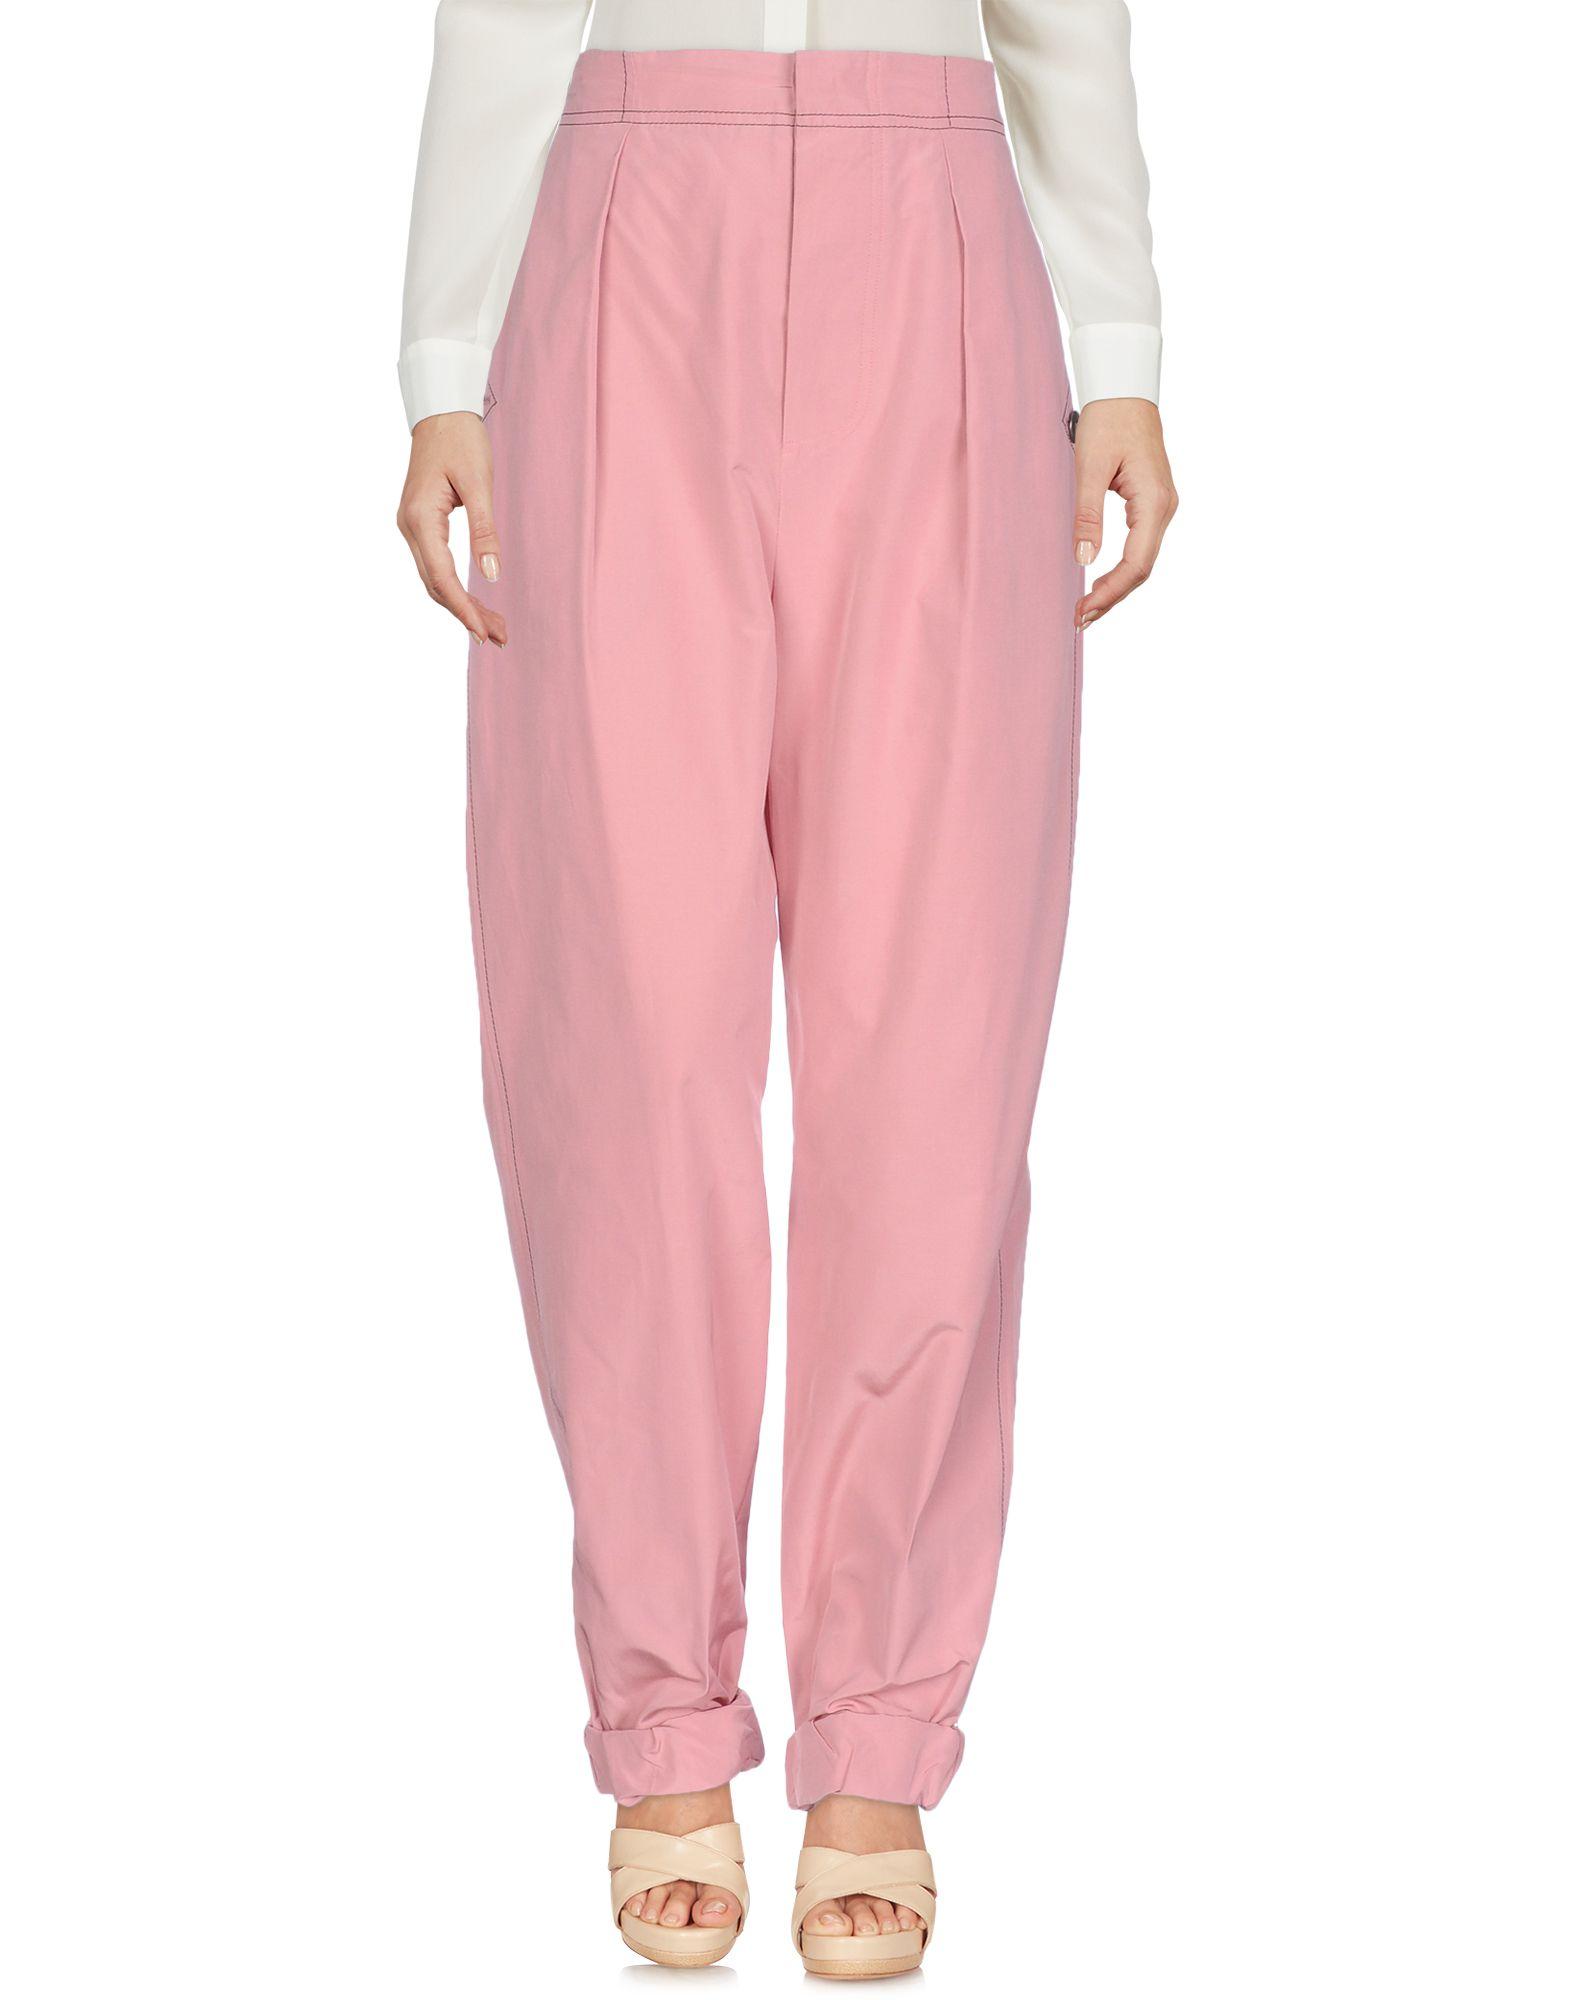 Pantalone Bottega Veneta Donna - Acquista online su